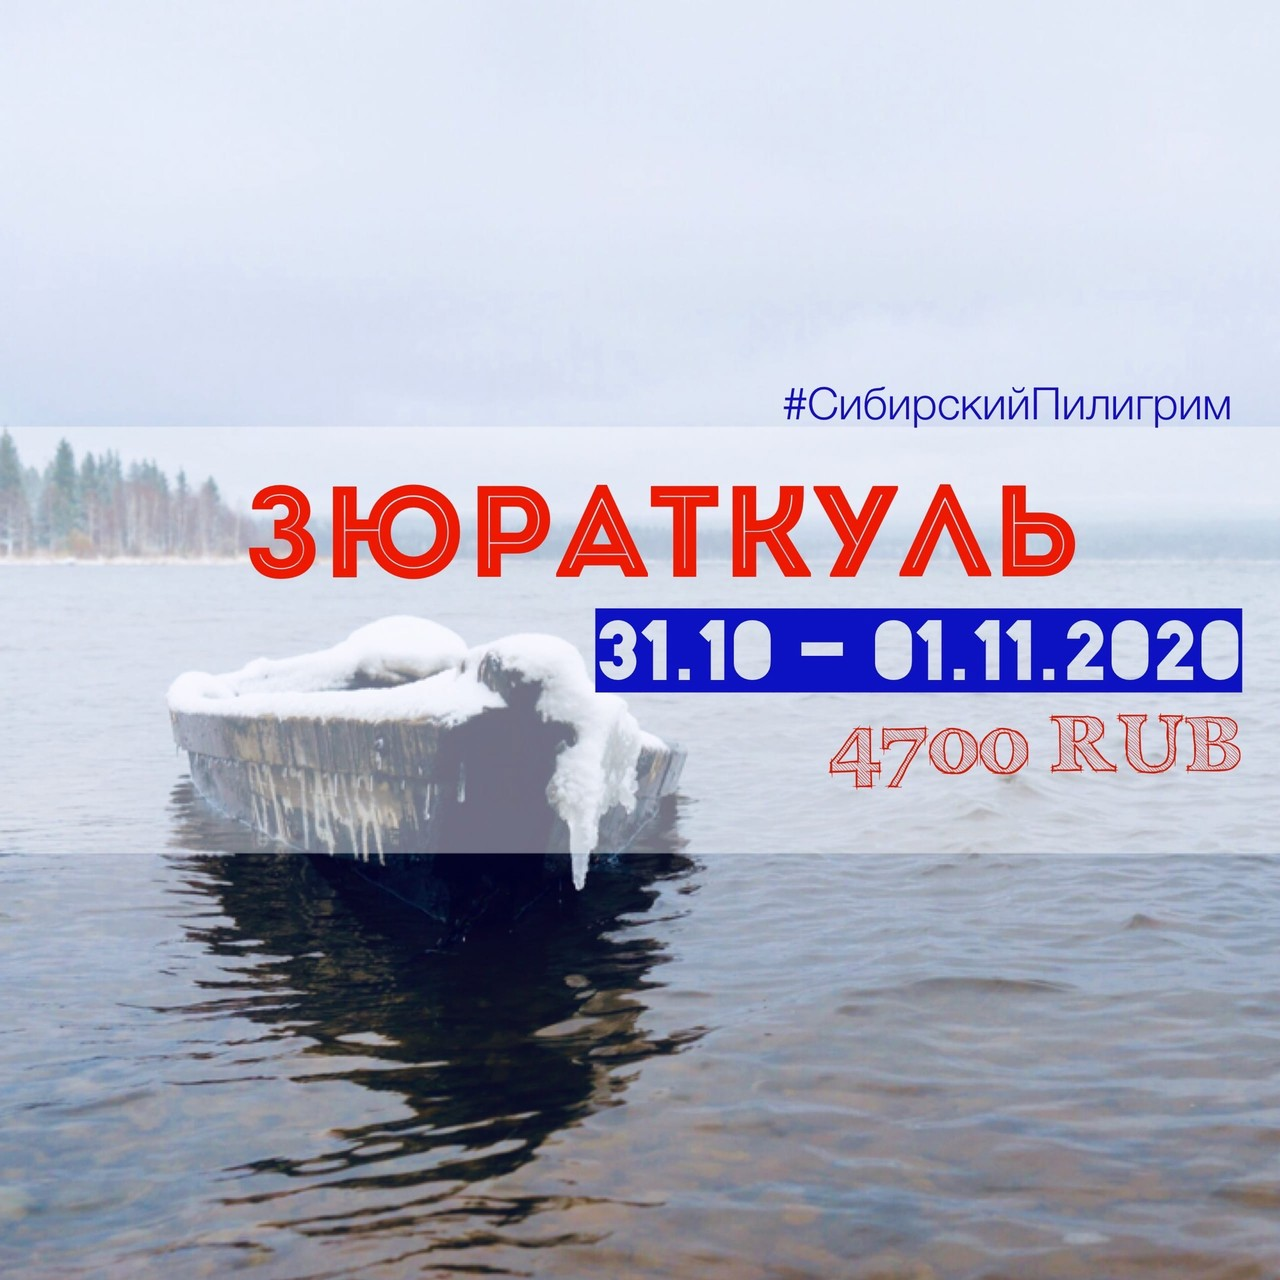 Афиша Тюмень Зюраткуль: 31.10 - 01.11.2020